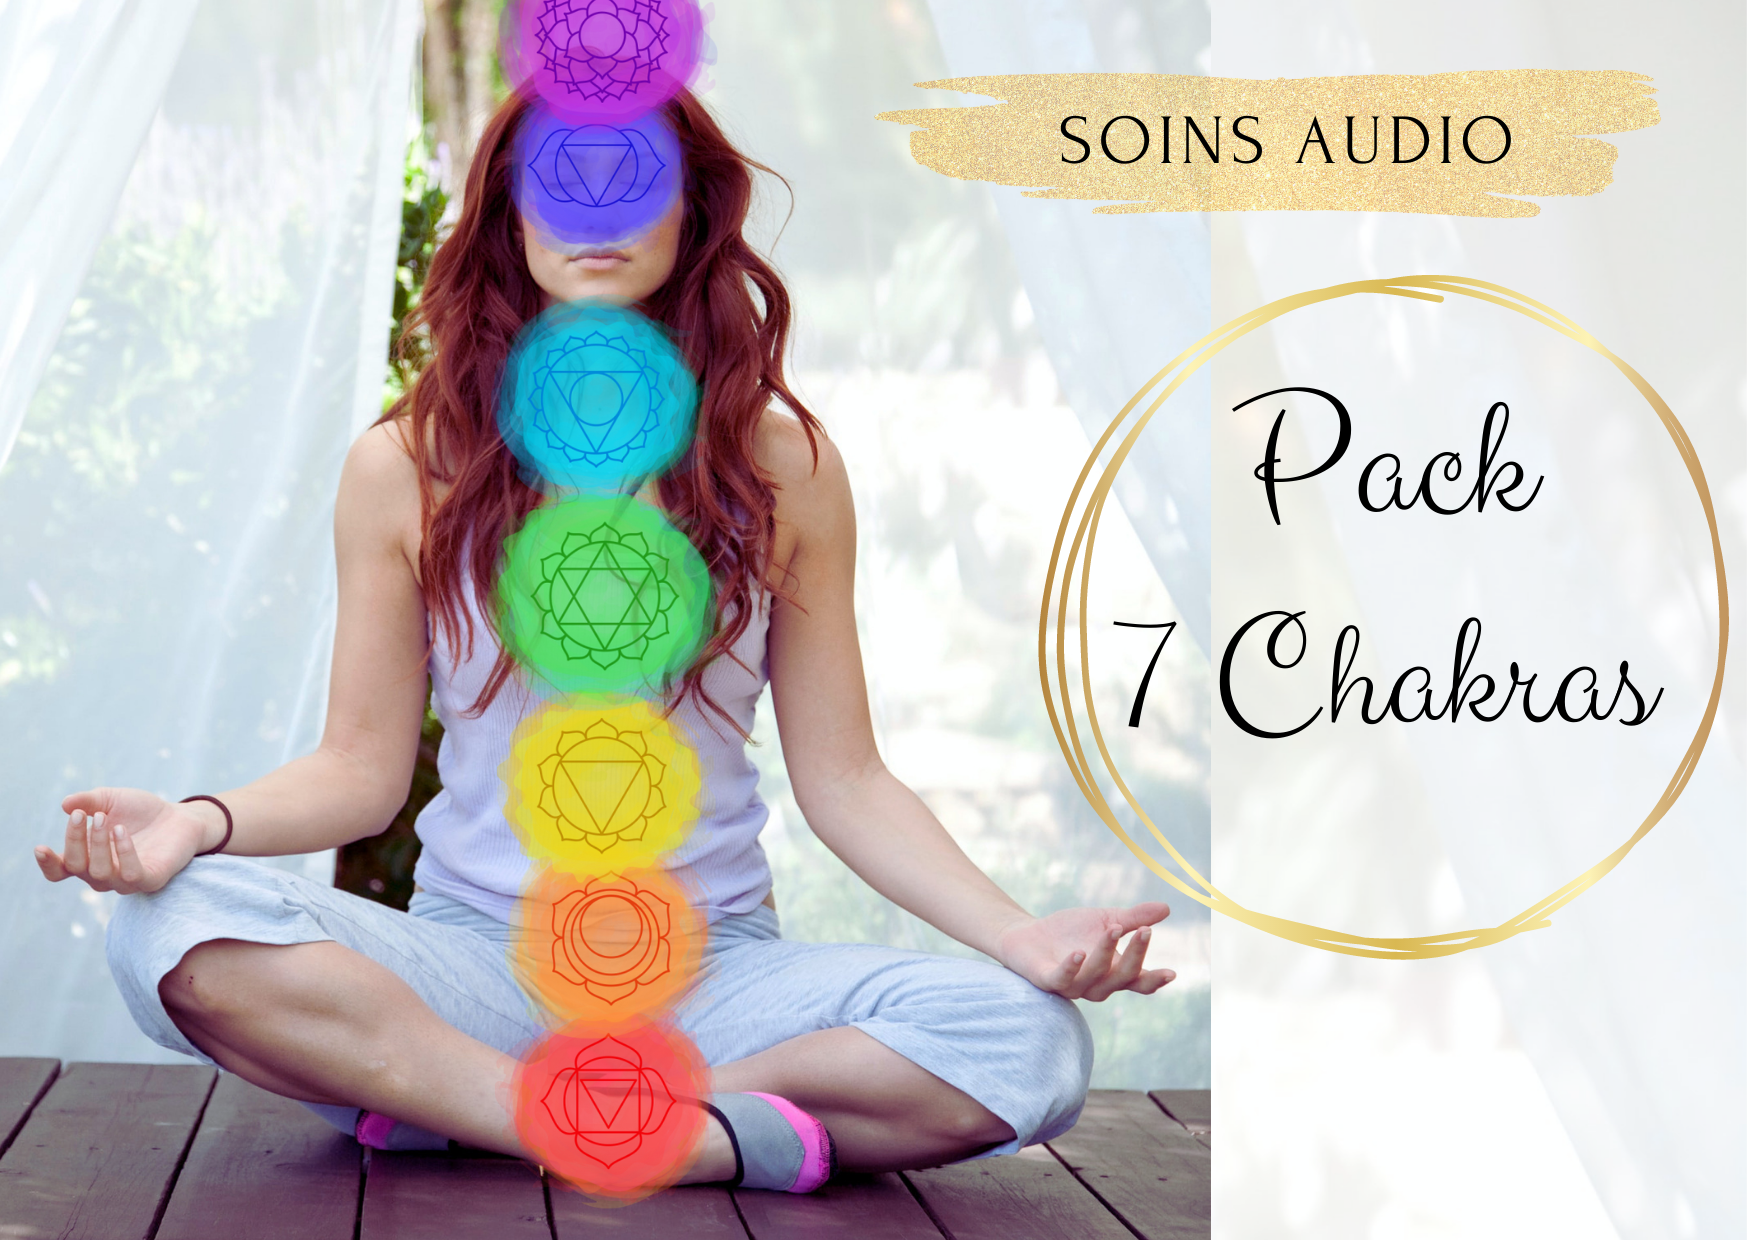 soin audio pack chakras